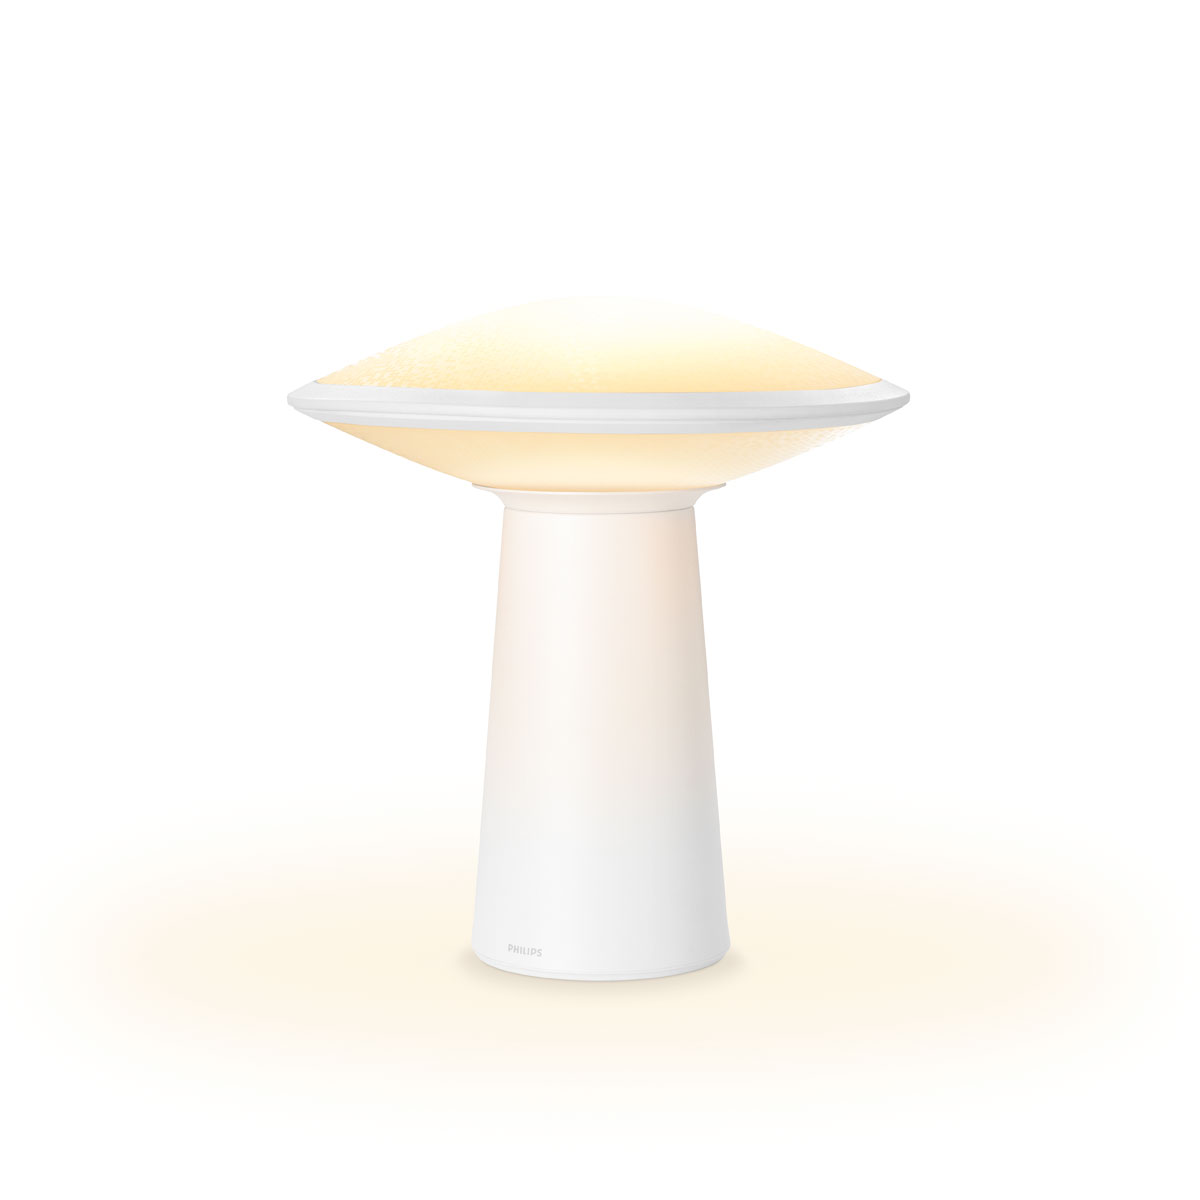 philips hue phoenix tafellamp. Black Bedroom Furniture Sets. Home Design Ideas